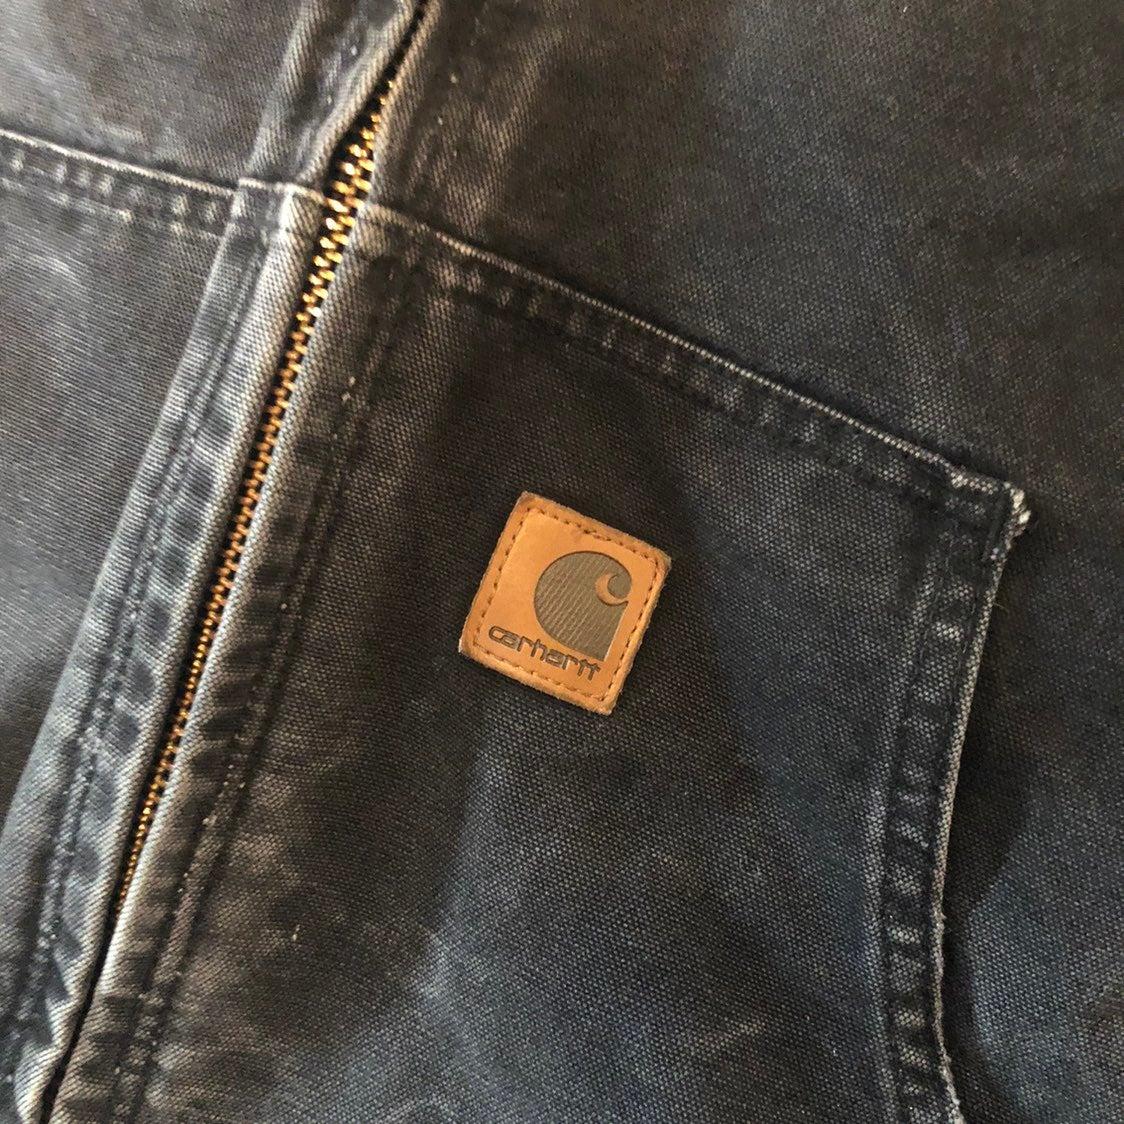 VTG Carhartt Denim Distressed Jacket